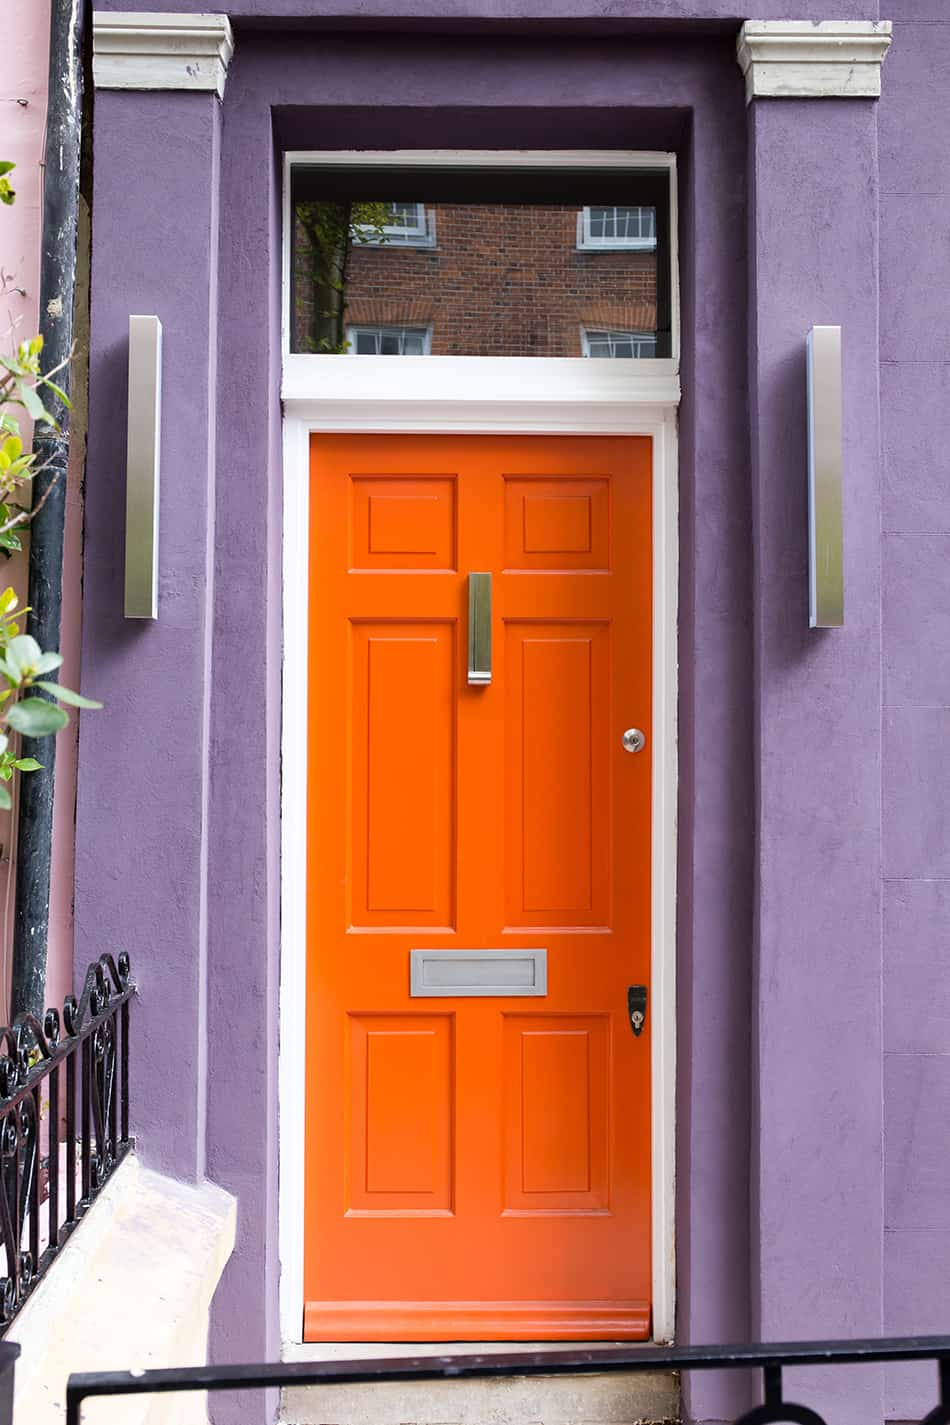 Crimson Orange on Purple for Curb Appeal